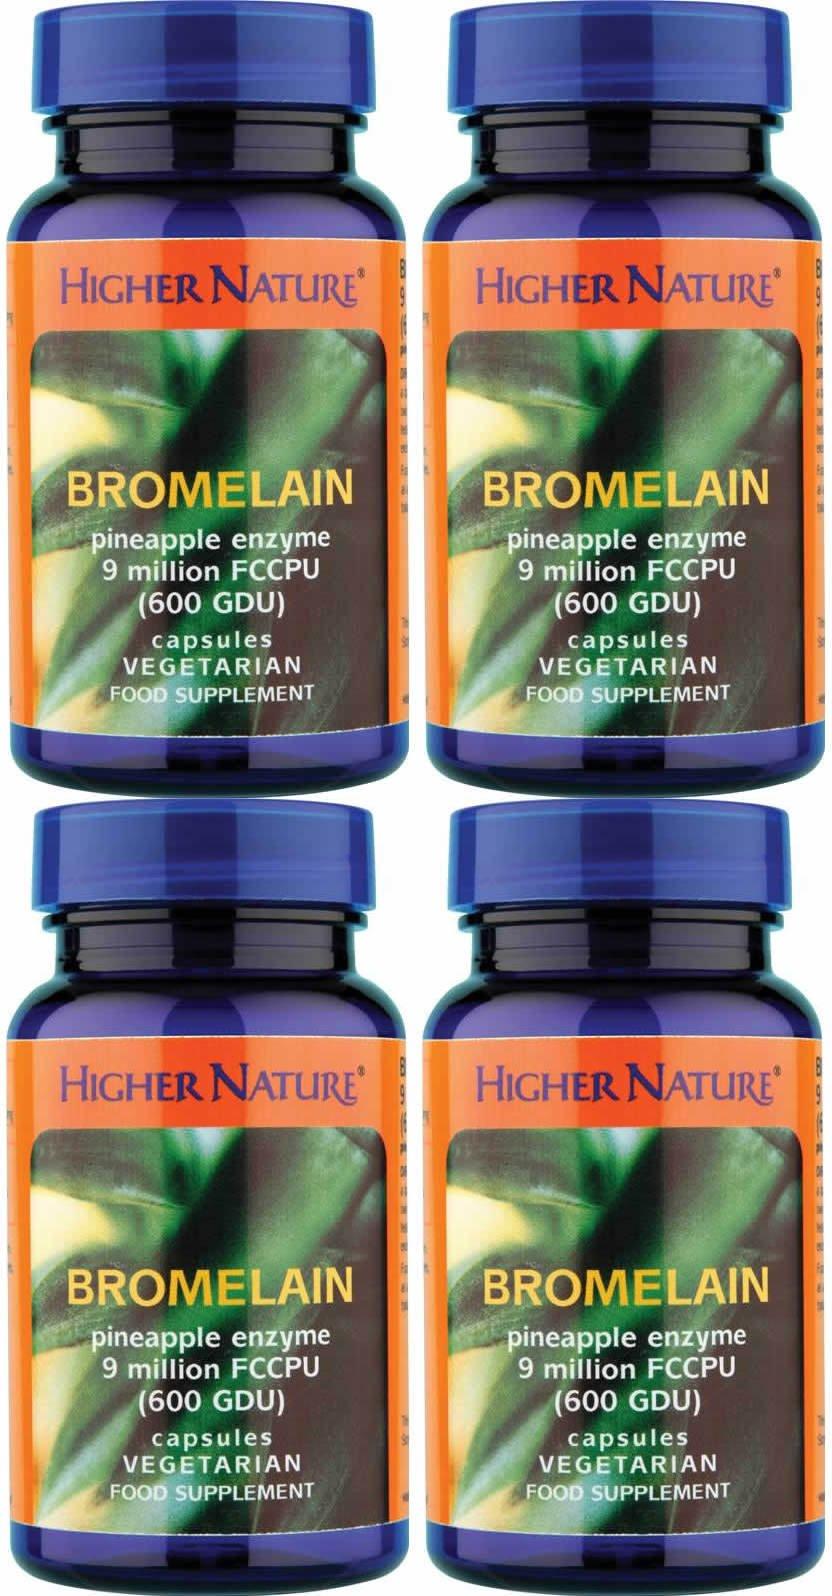 (4 PACK) - Higher Nature - Bromelain   90's   4 PACK BUNDLE